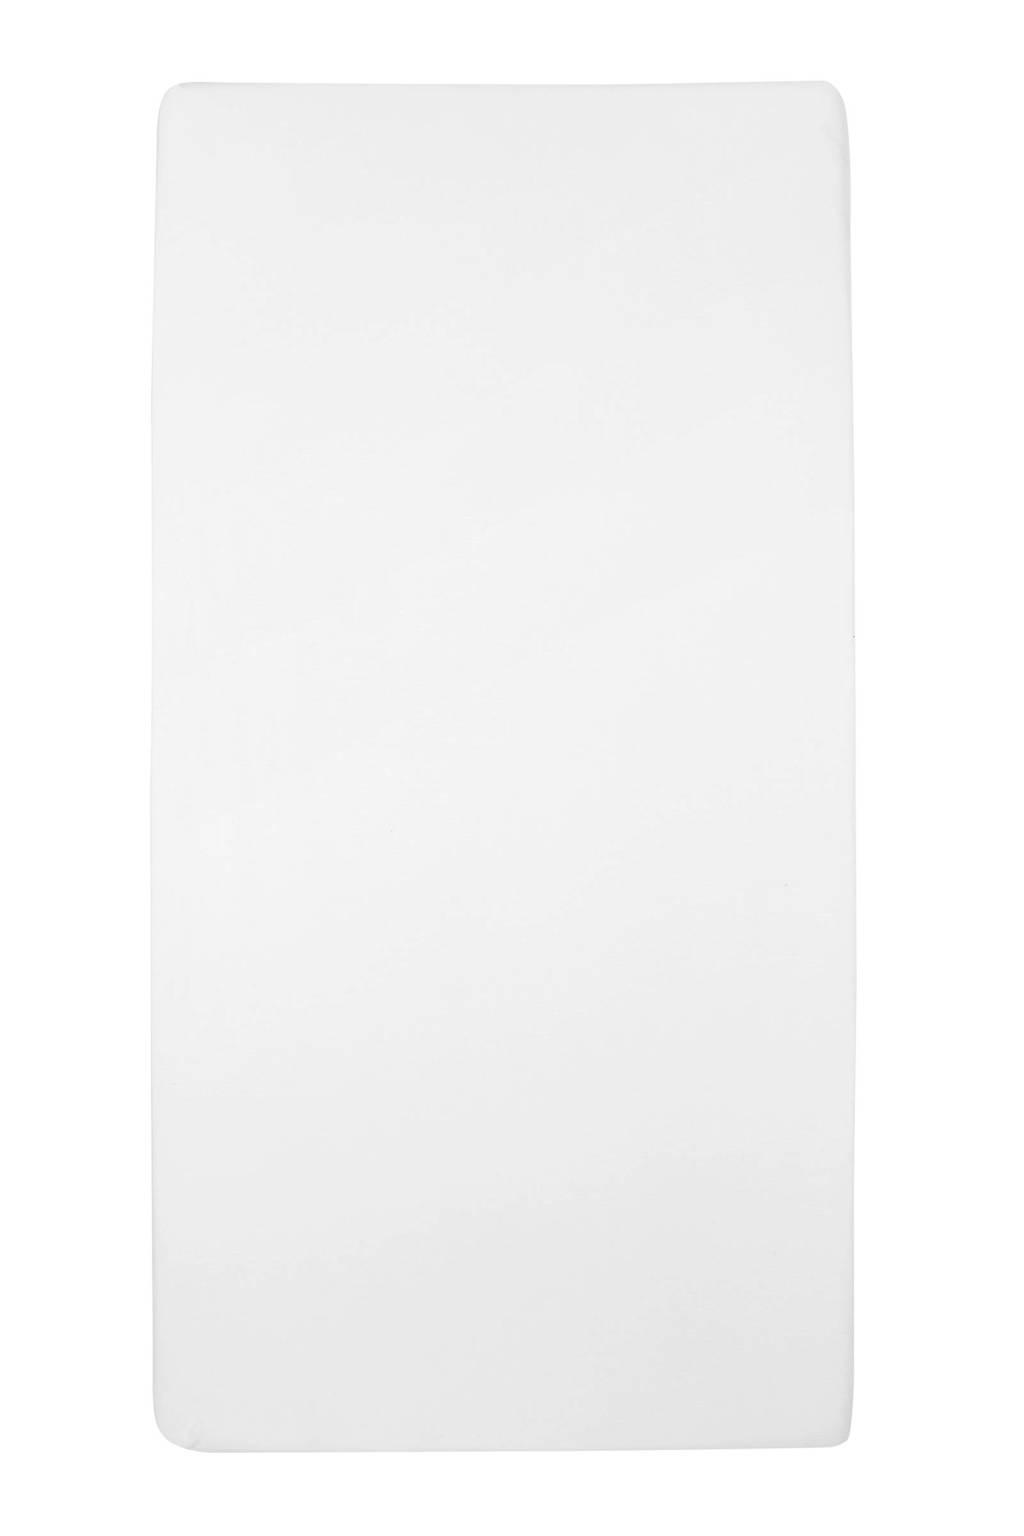 Meyco jersey hoeslaken peuterbed 70x140/150 cm Wit